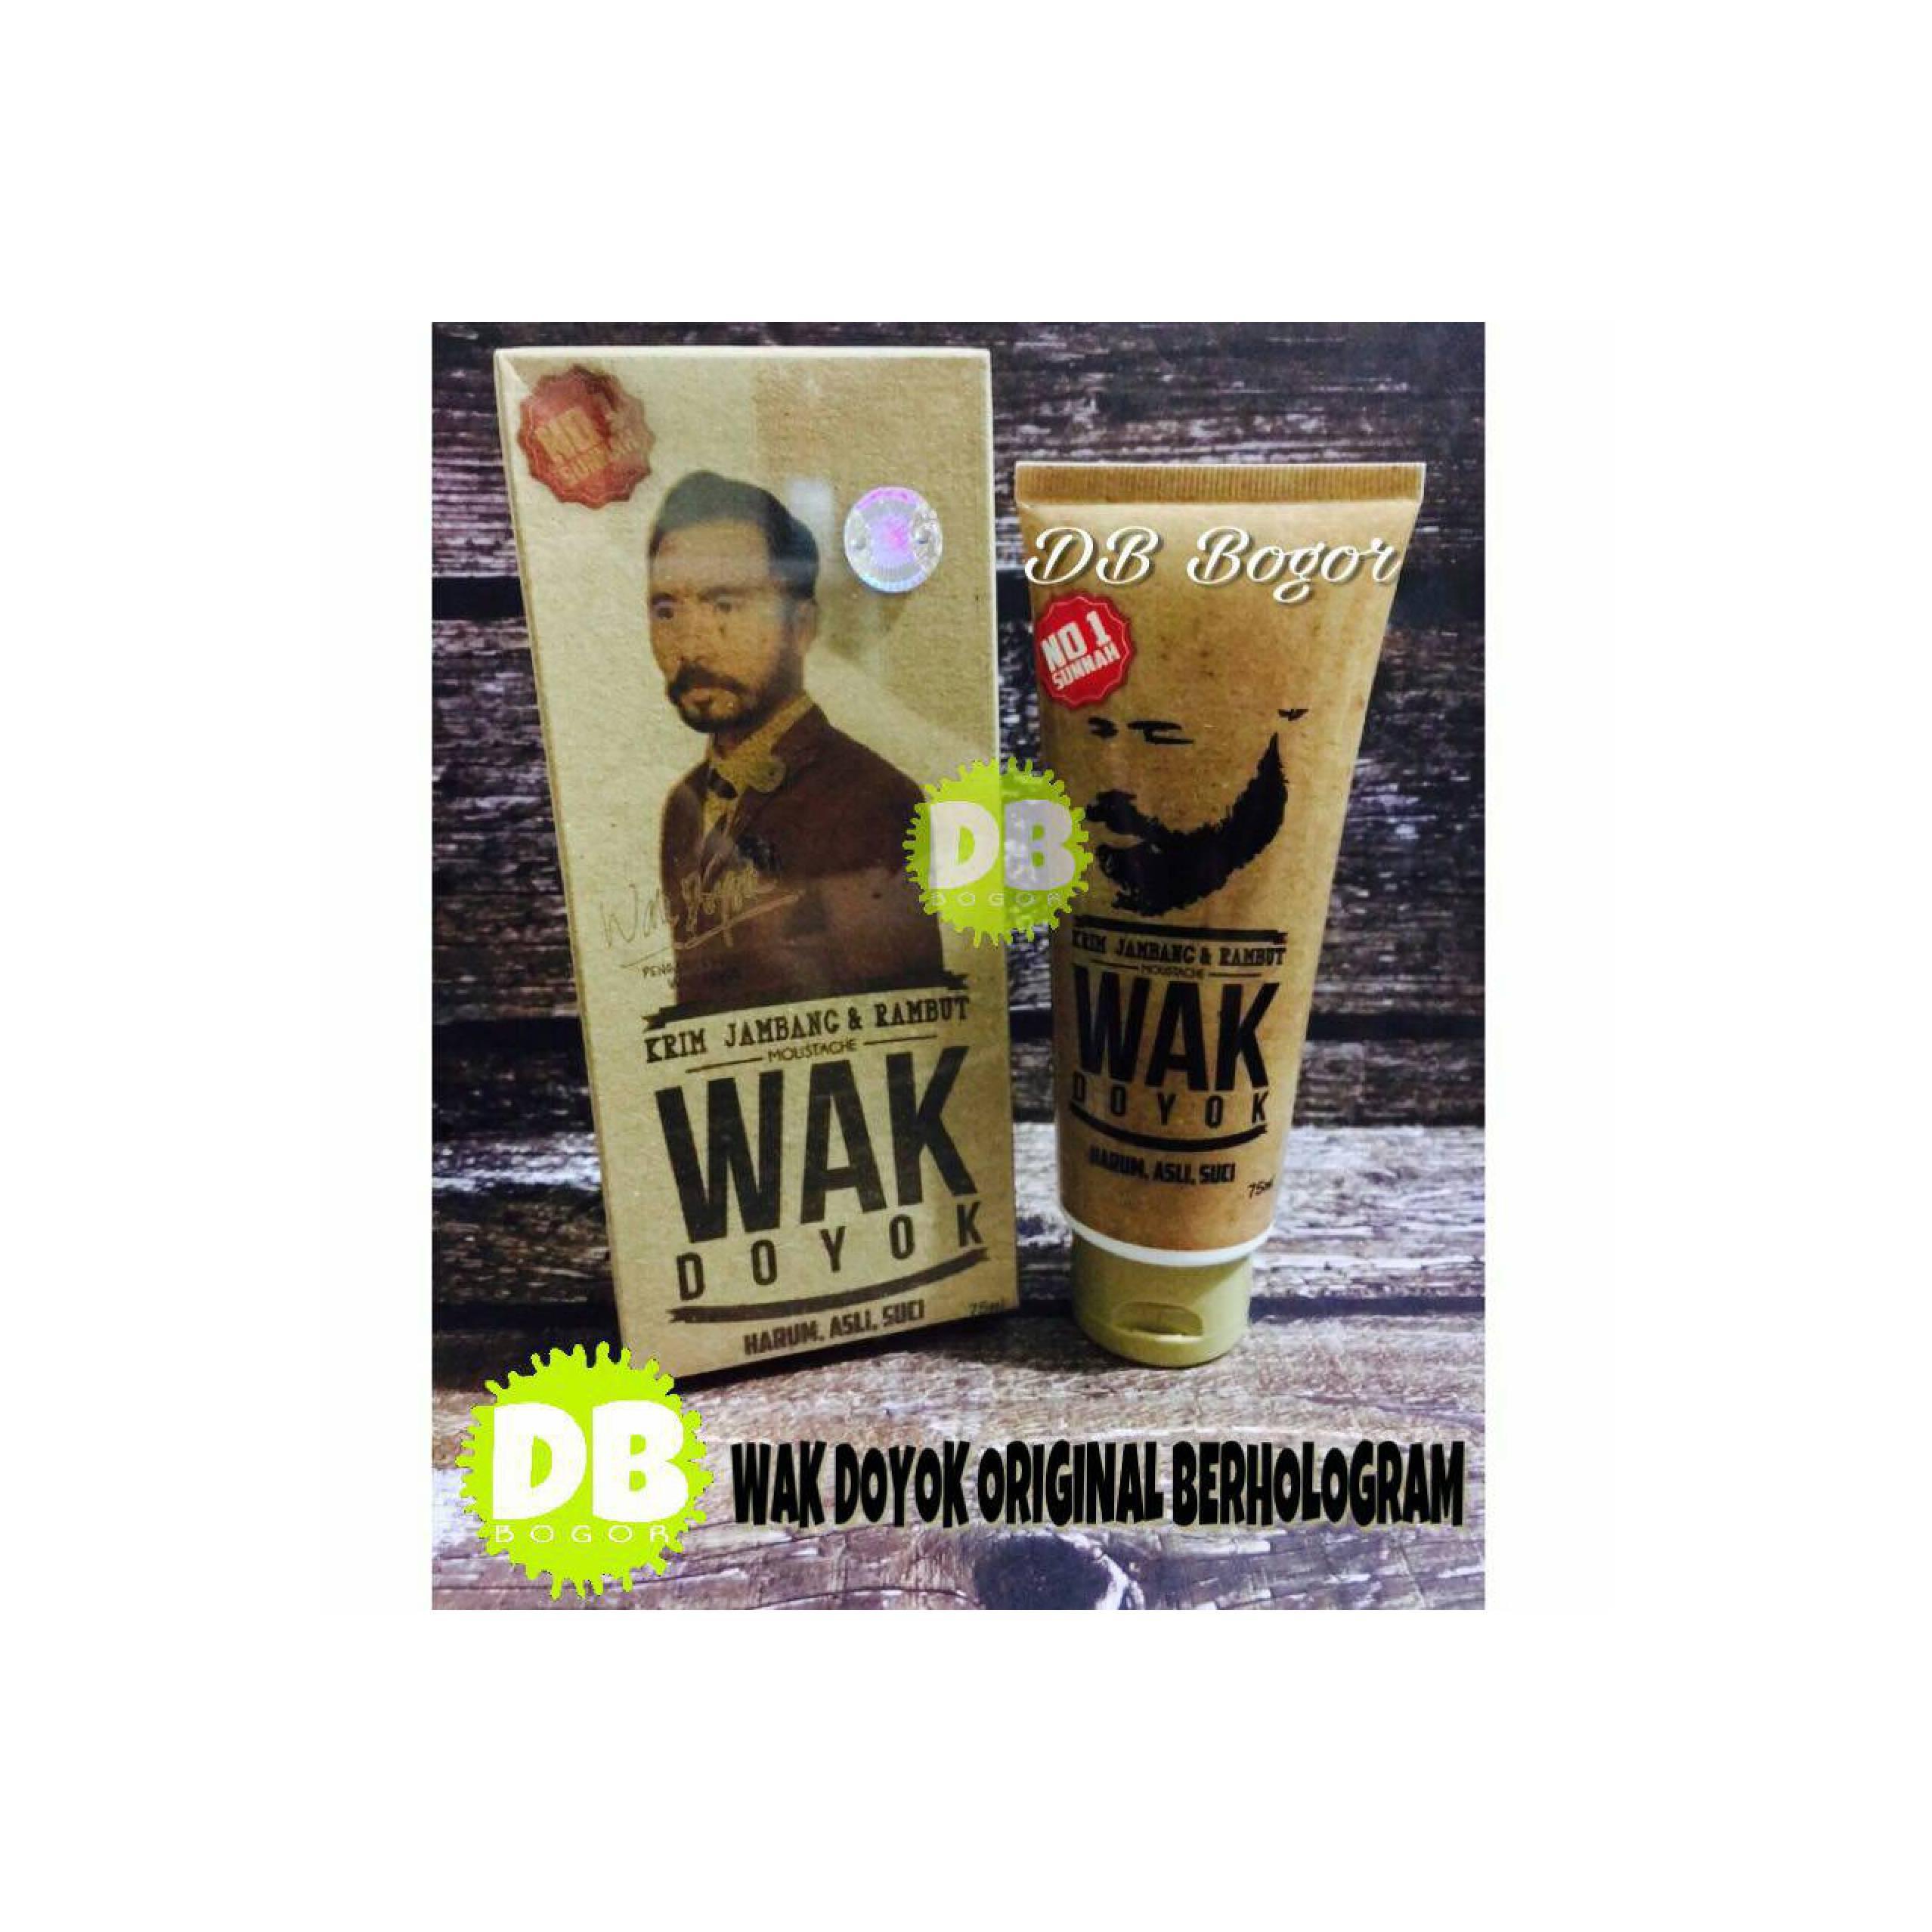 Hoki Cod Cream Wak Doyok Penumbuh Rambut Jambang Premium Kumis Krim Wakdoyok Sample Jar Original 100 Source Ukuran Free Pinset Jepit Komedo 1 Pcs Terbaru